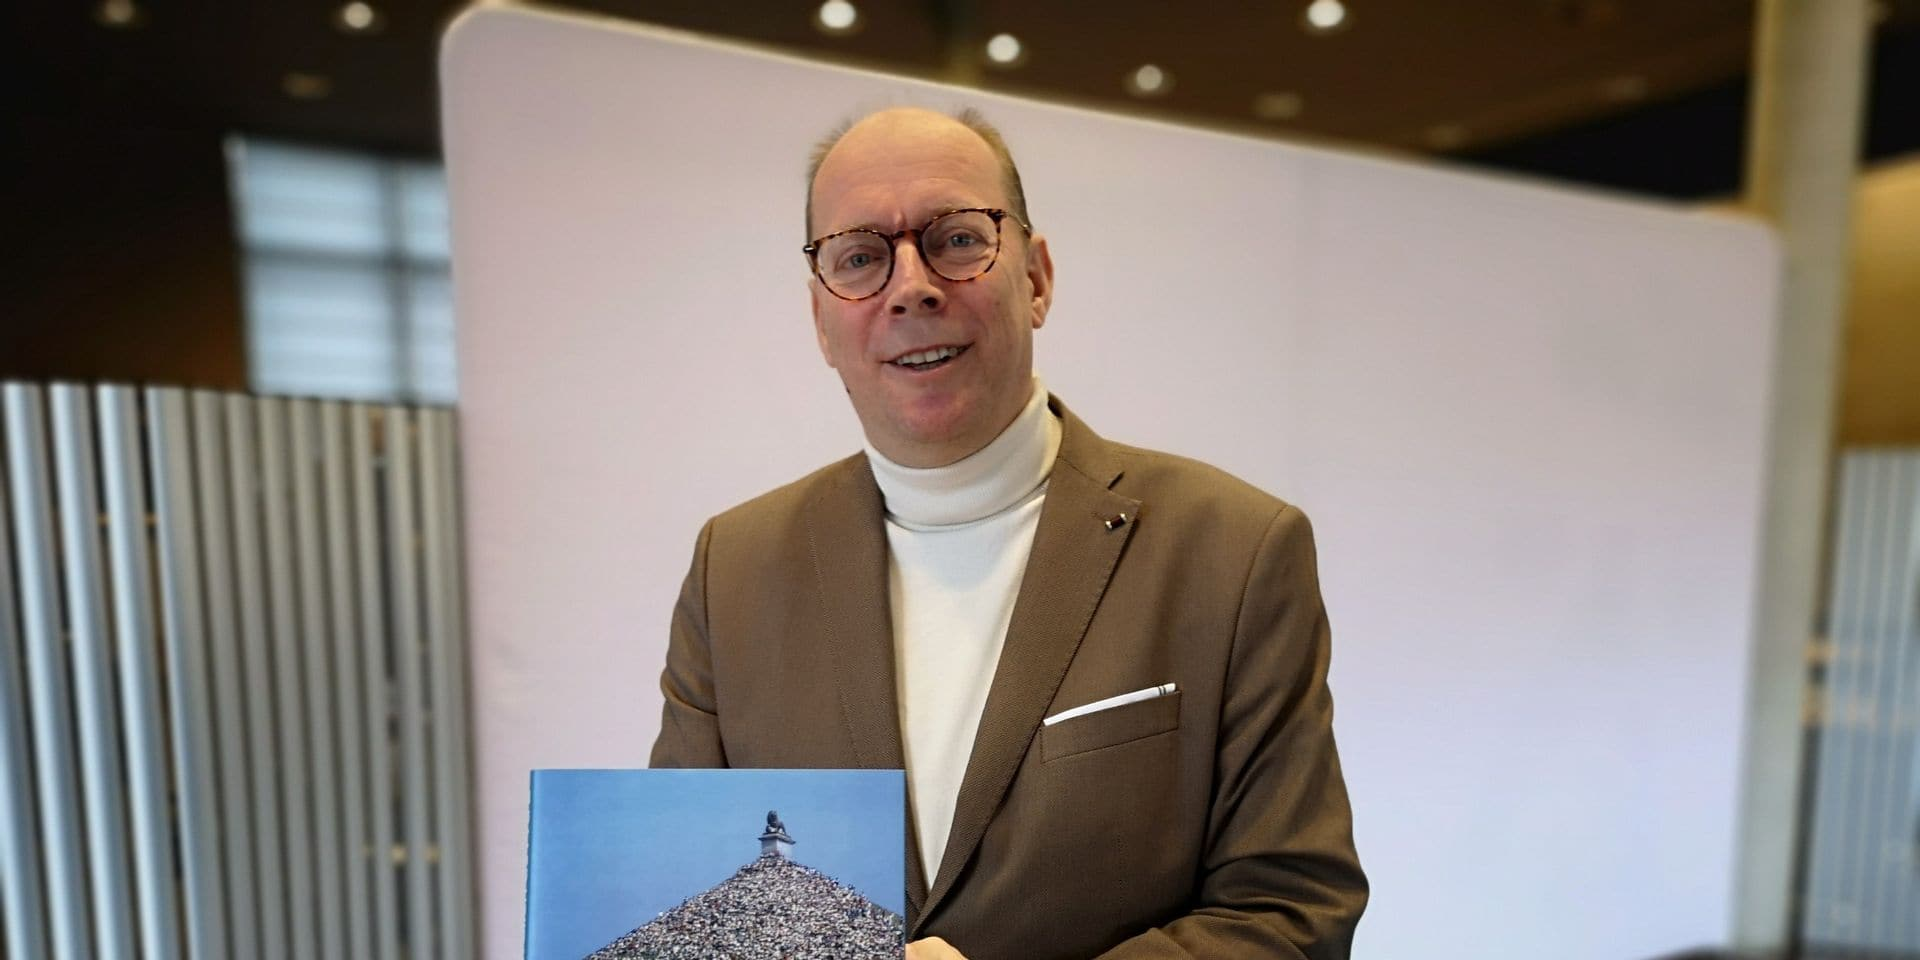 Yves Vander Cruysen, premier échevin à Waterloo, est aux soins intensifs